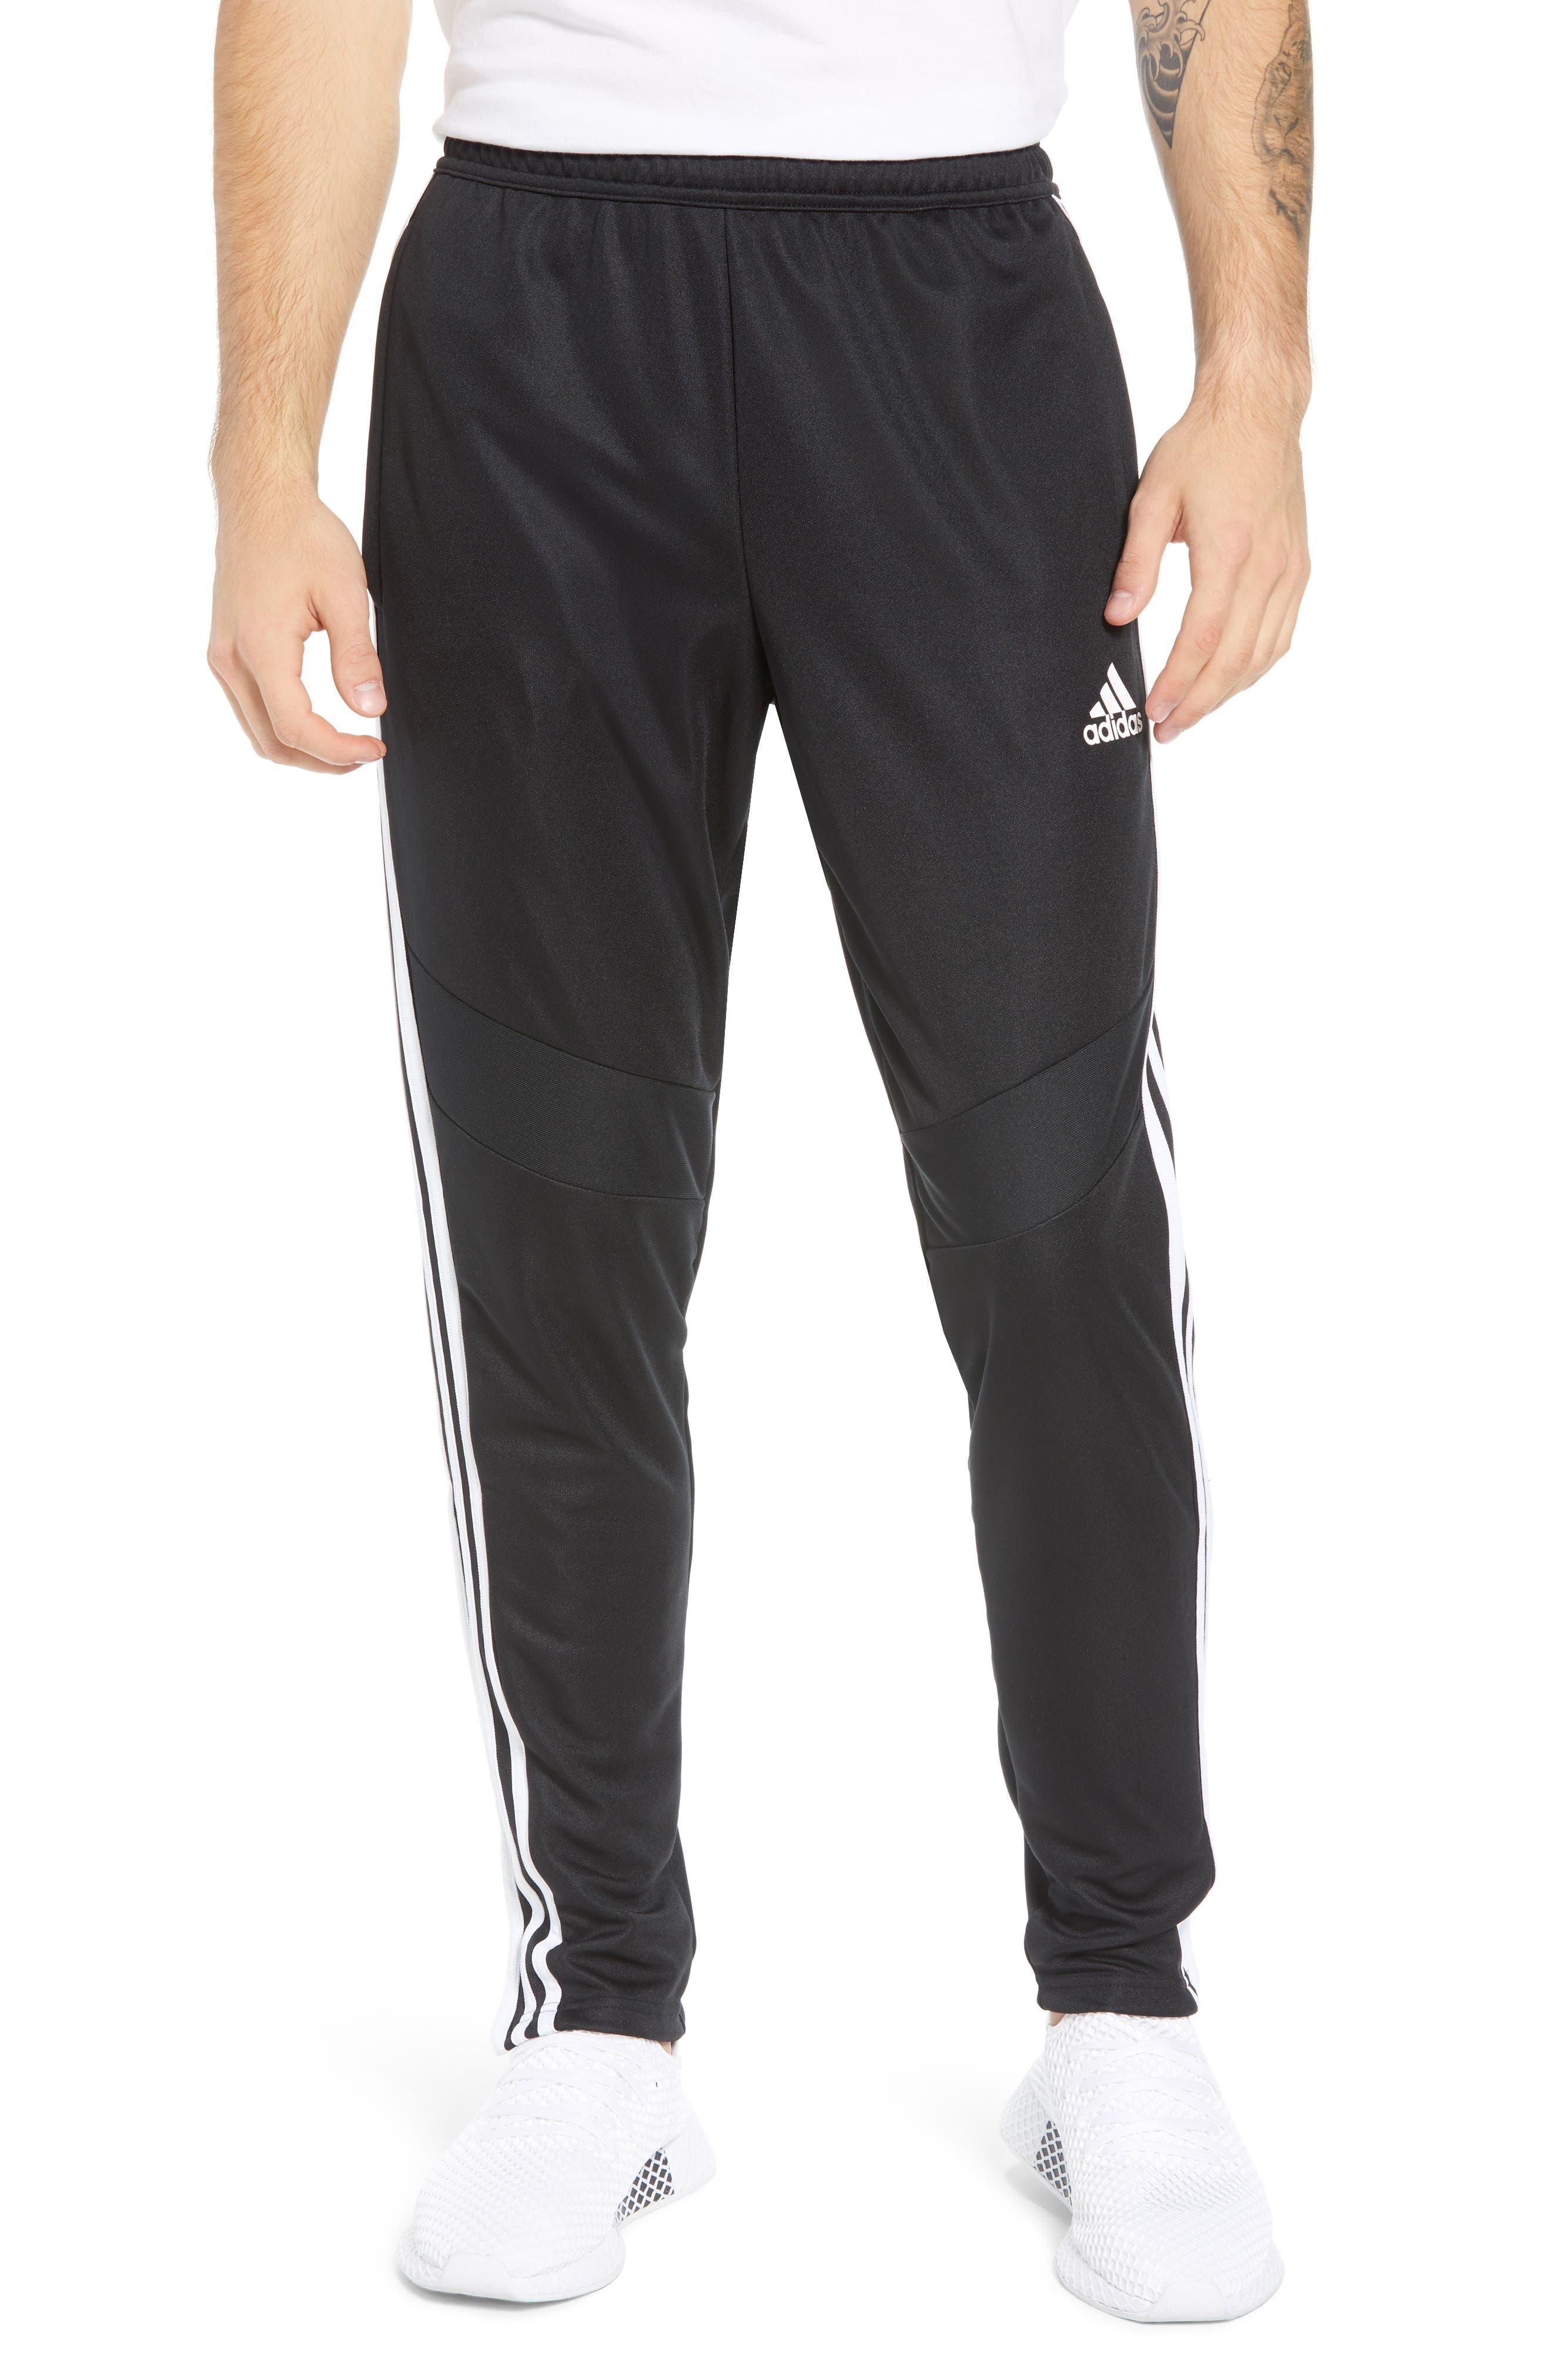 ADIDAS Tiro Soccer Training Pants, Main, color, BLACK/ WHITE